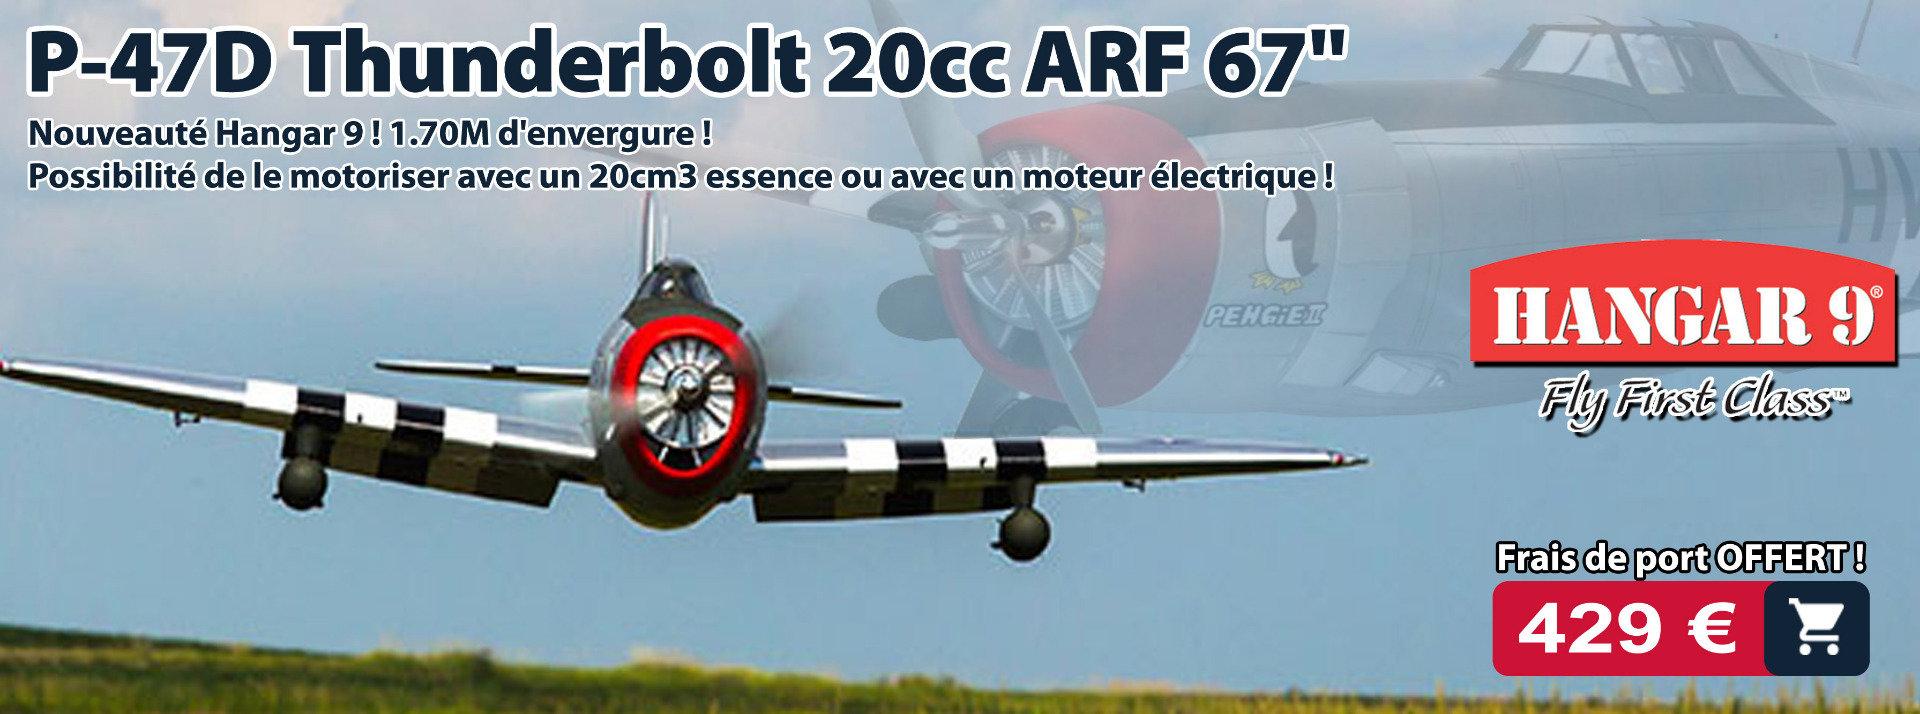 "P-47D Thunderbolt 20cc ARF 67"" (HAN2990) : avion warbird modélisme RC 20cm3"